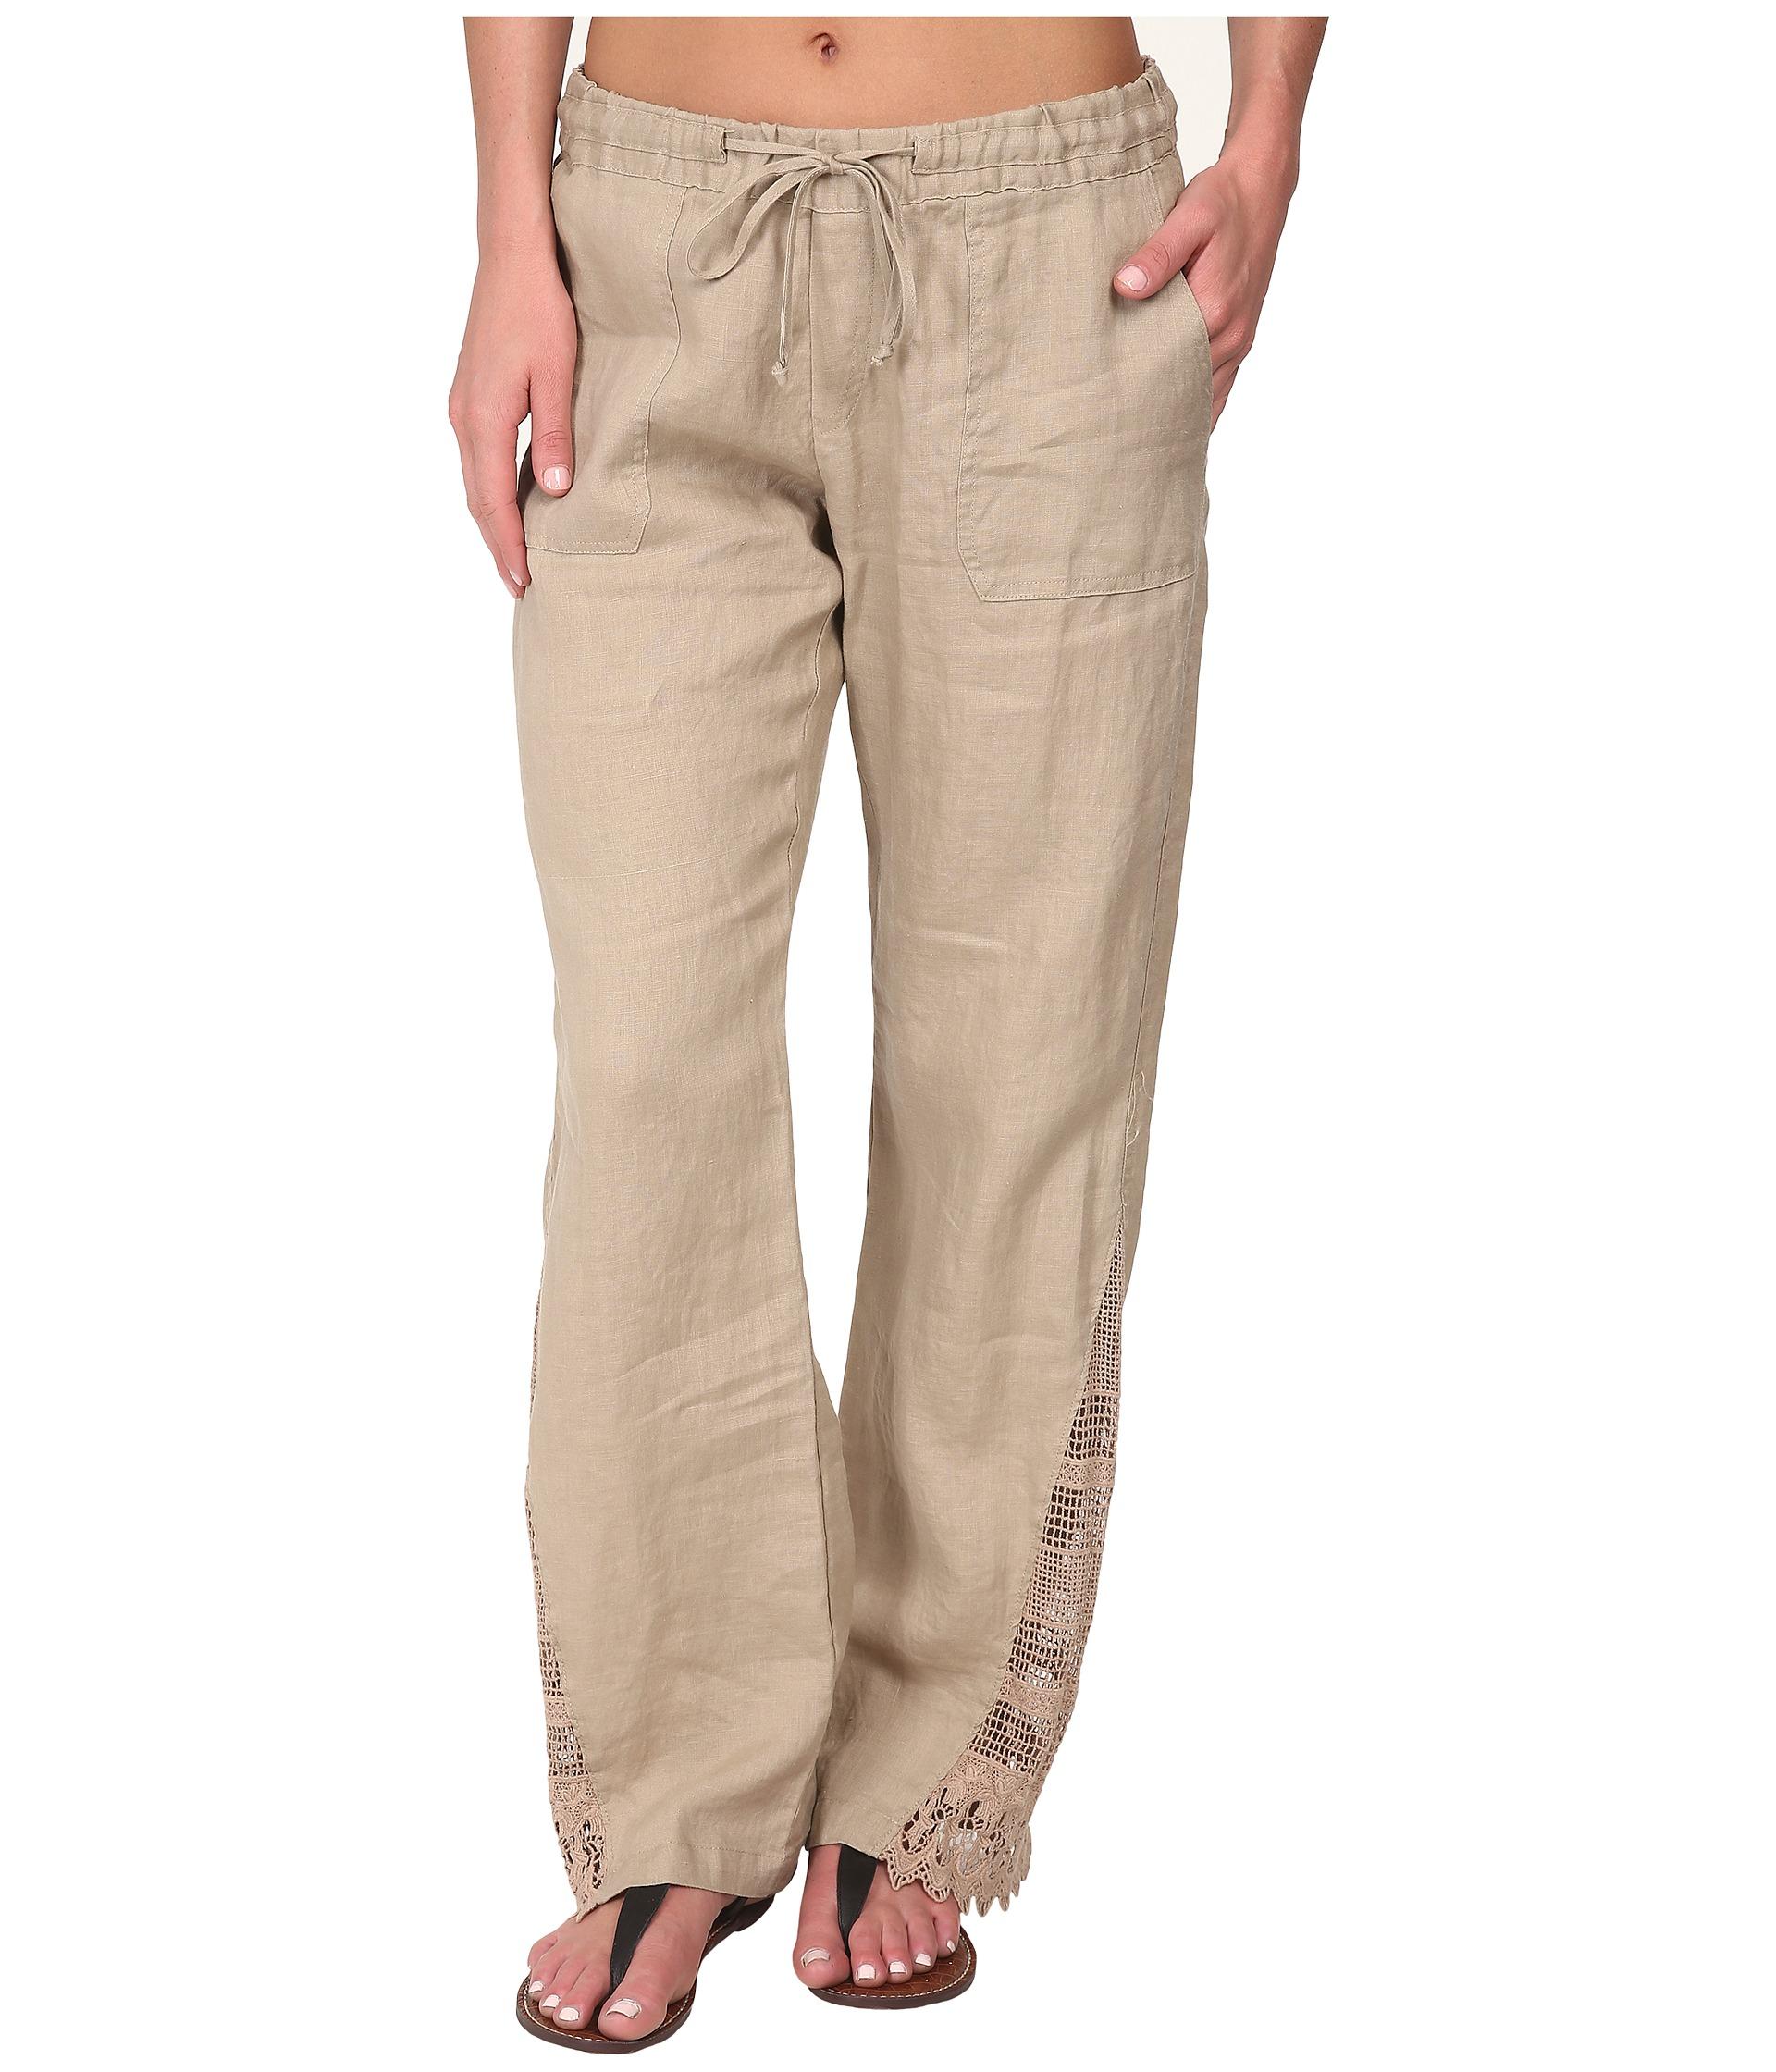 tan linen pants - Pi Pants